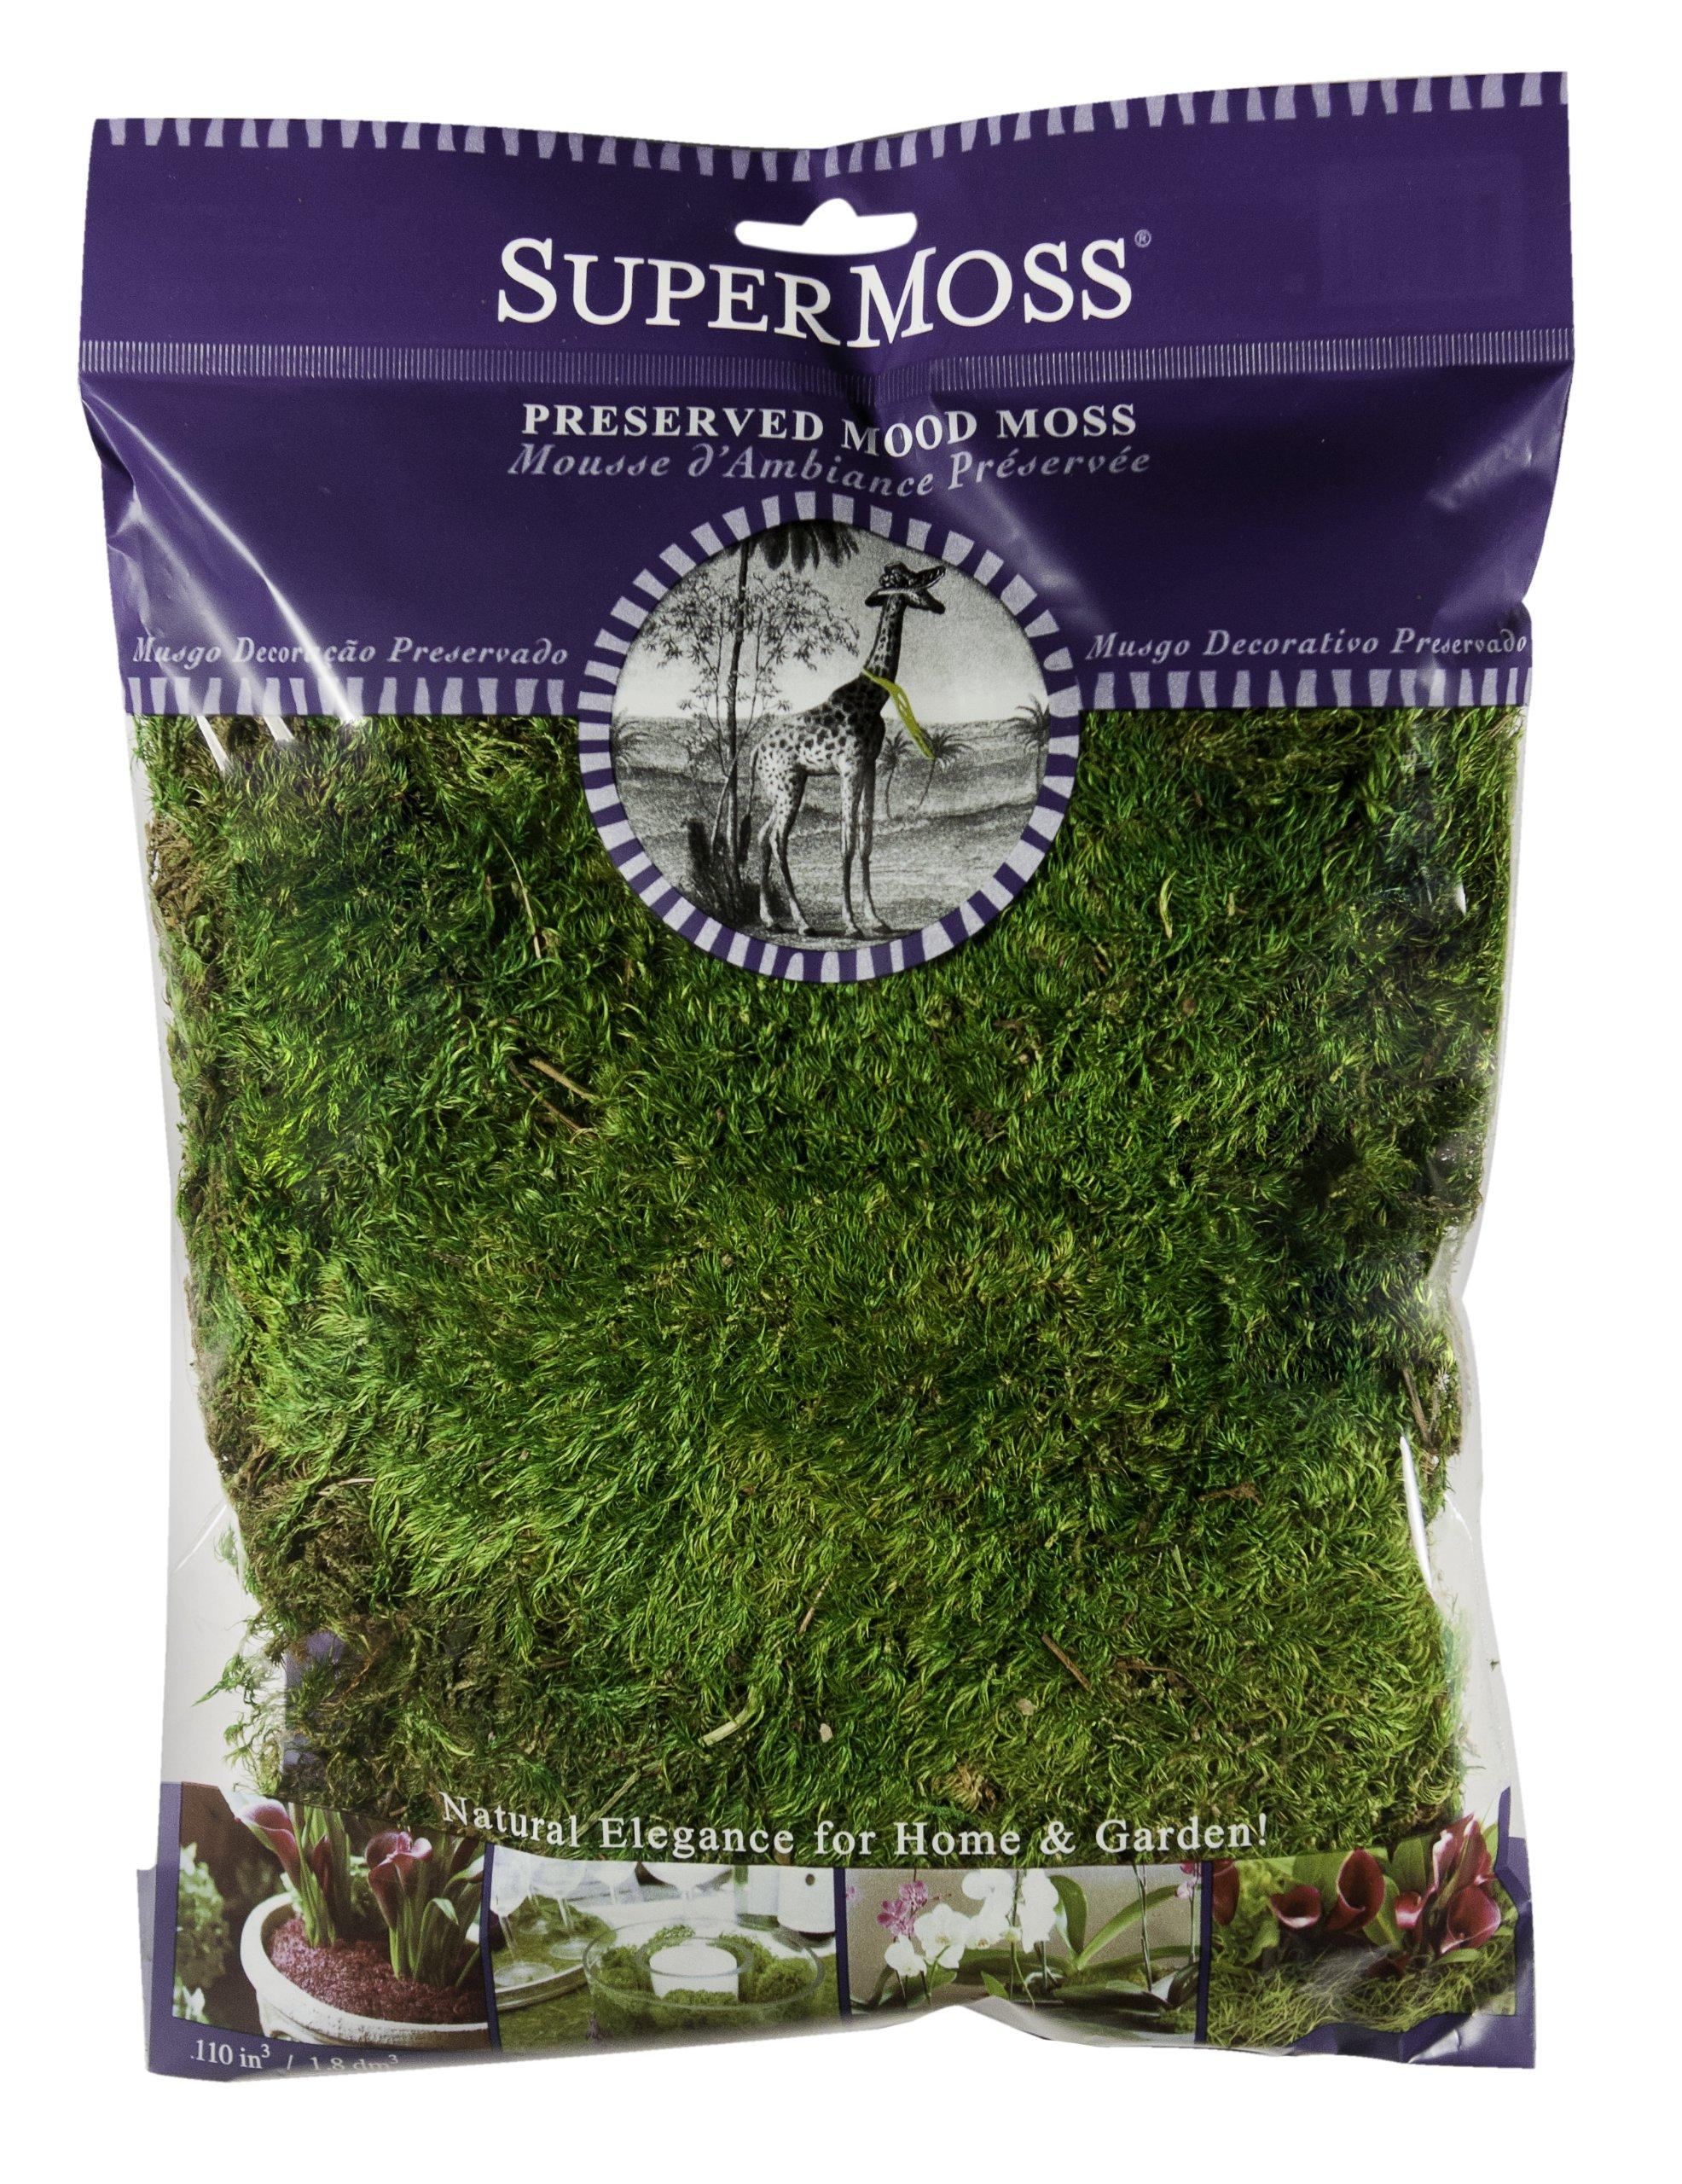 SuperMoss (21542) Mood Moss Preserved, Fresh Green, 4oz by Super Moss